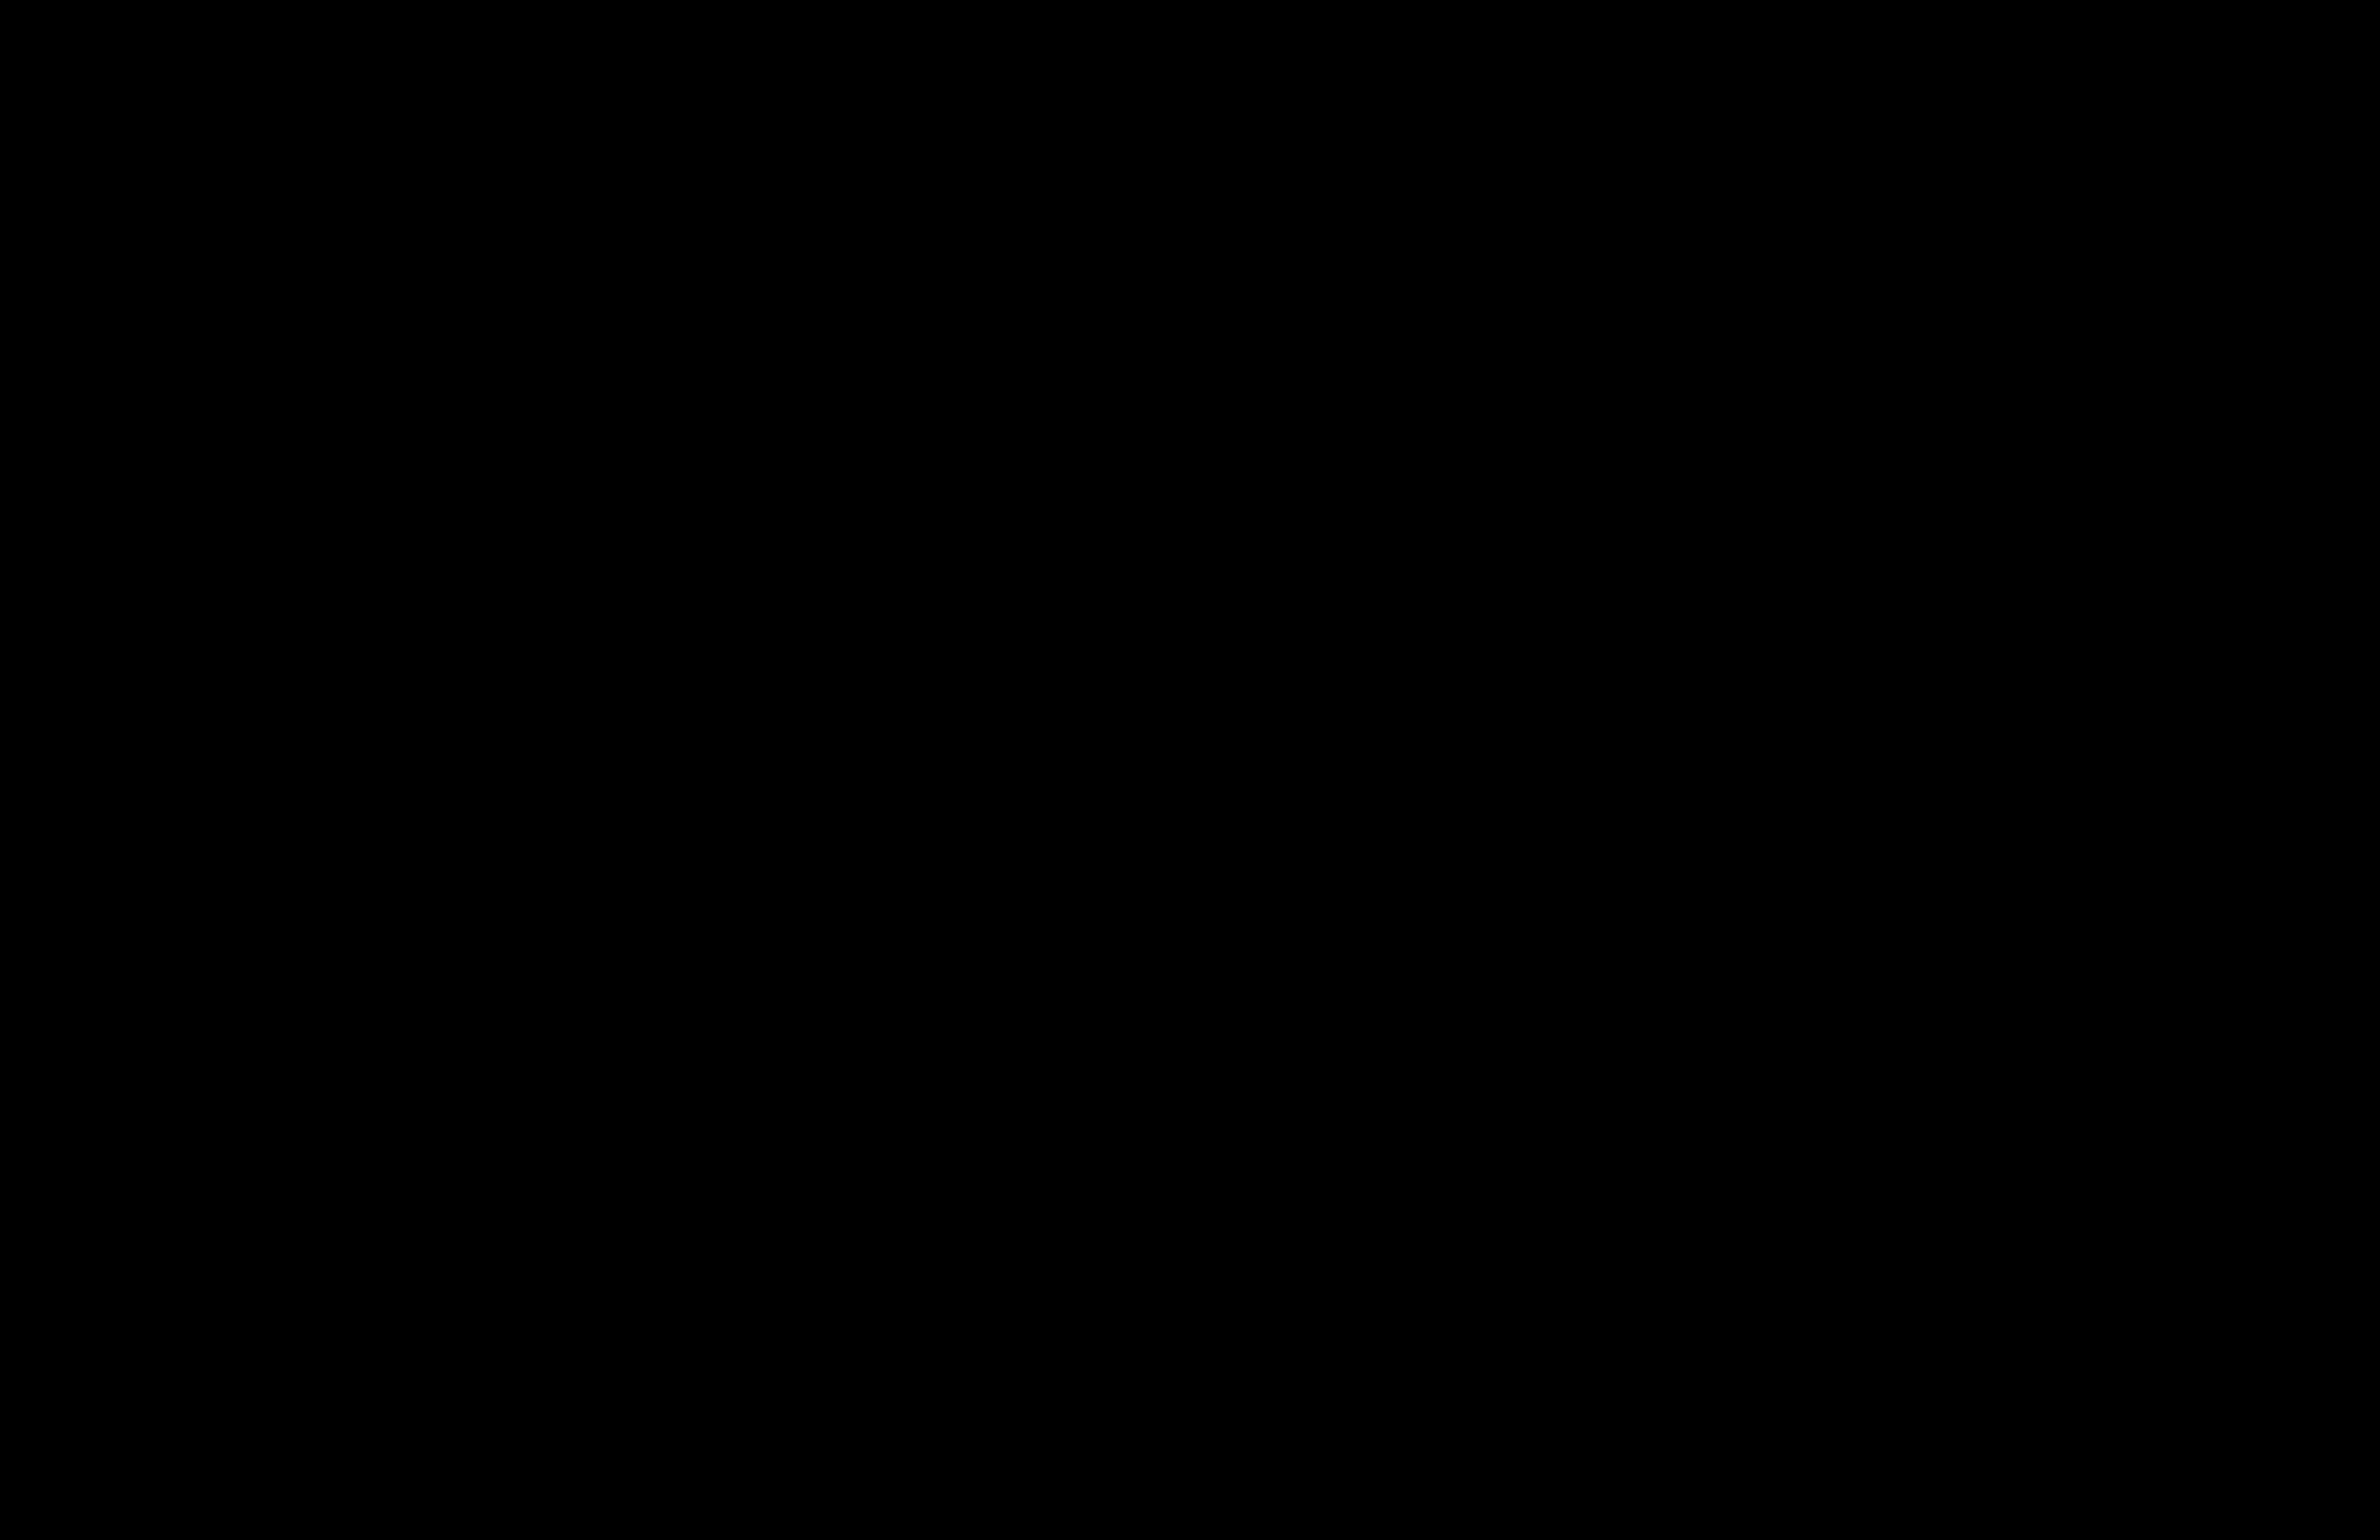 HSPCA Logo Black